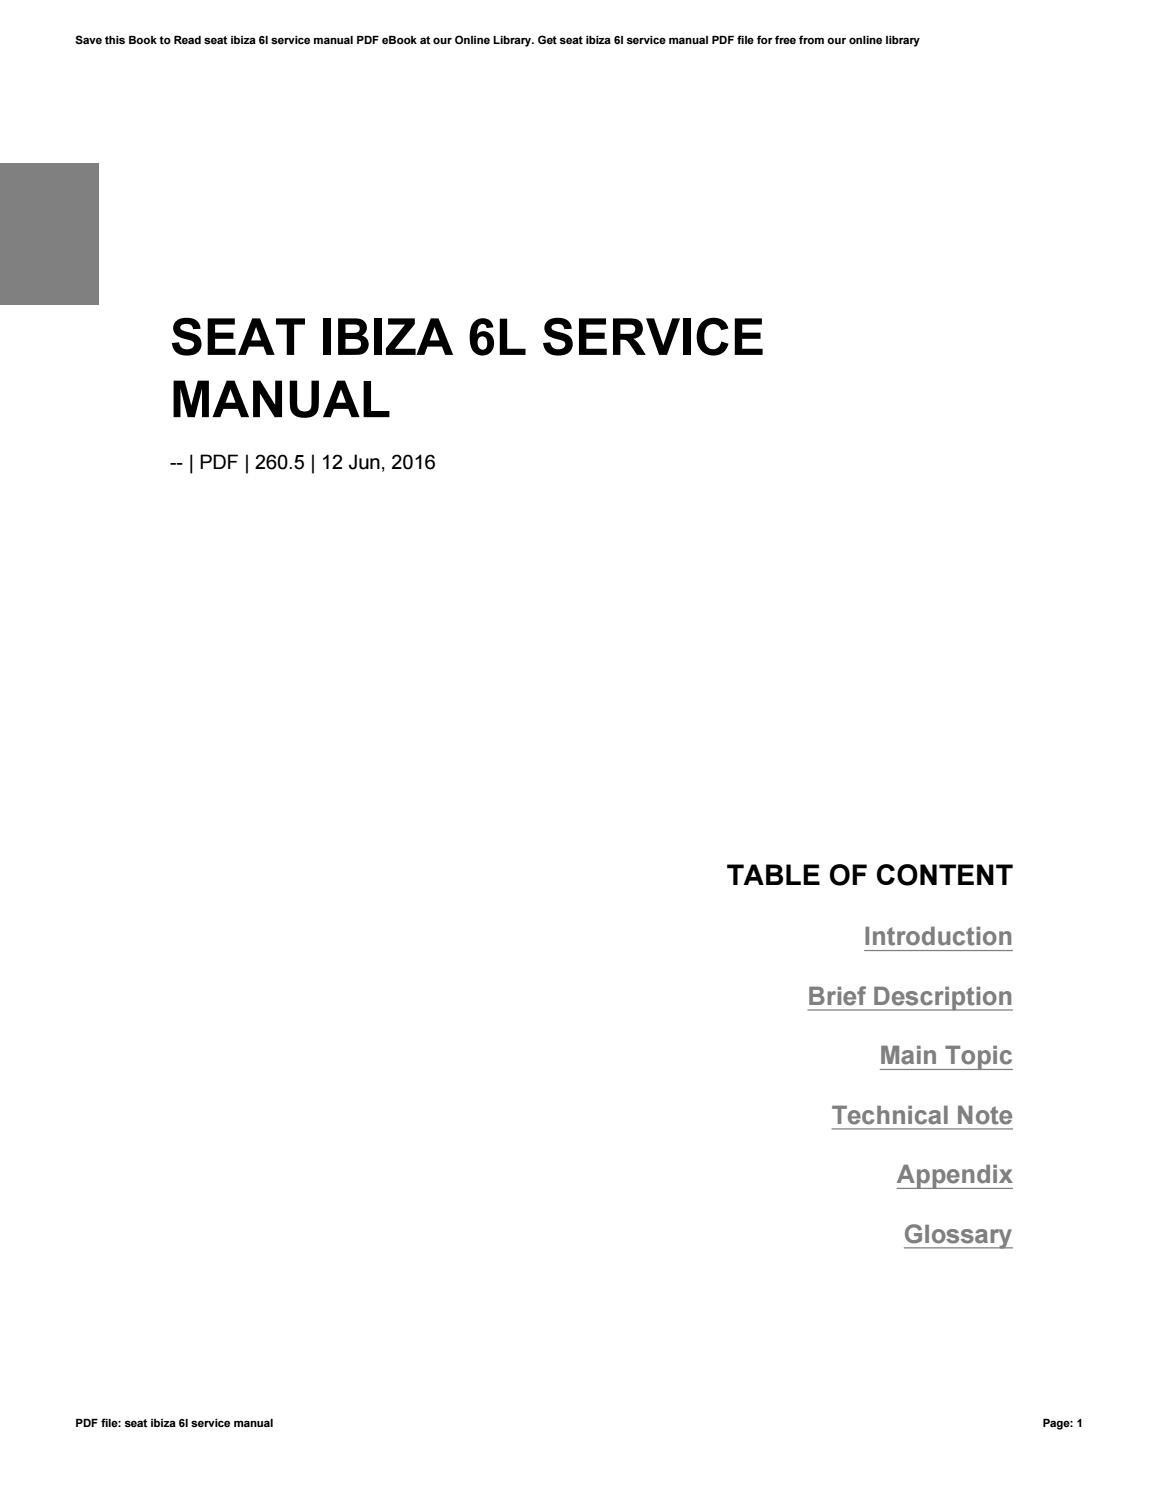 seat ibiza 6l service manual best setting instruction guide